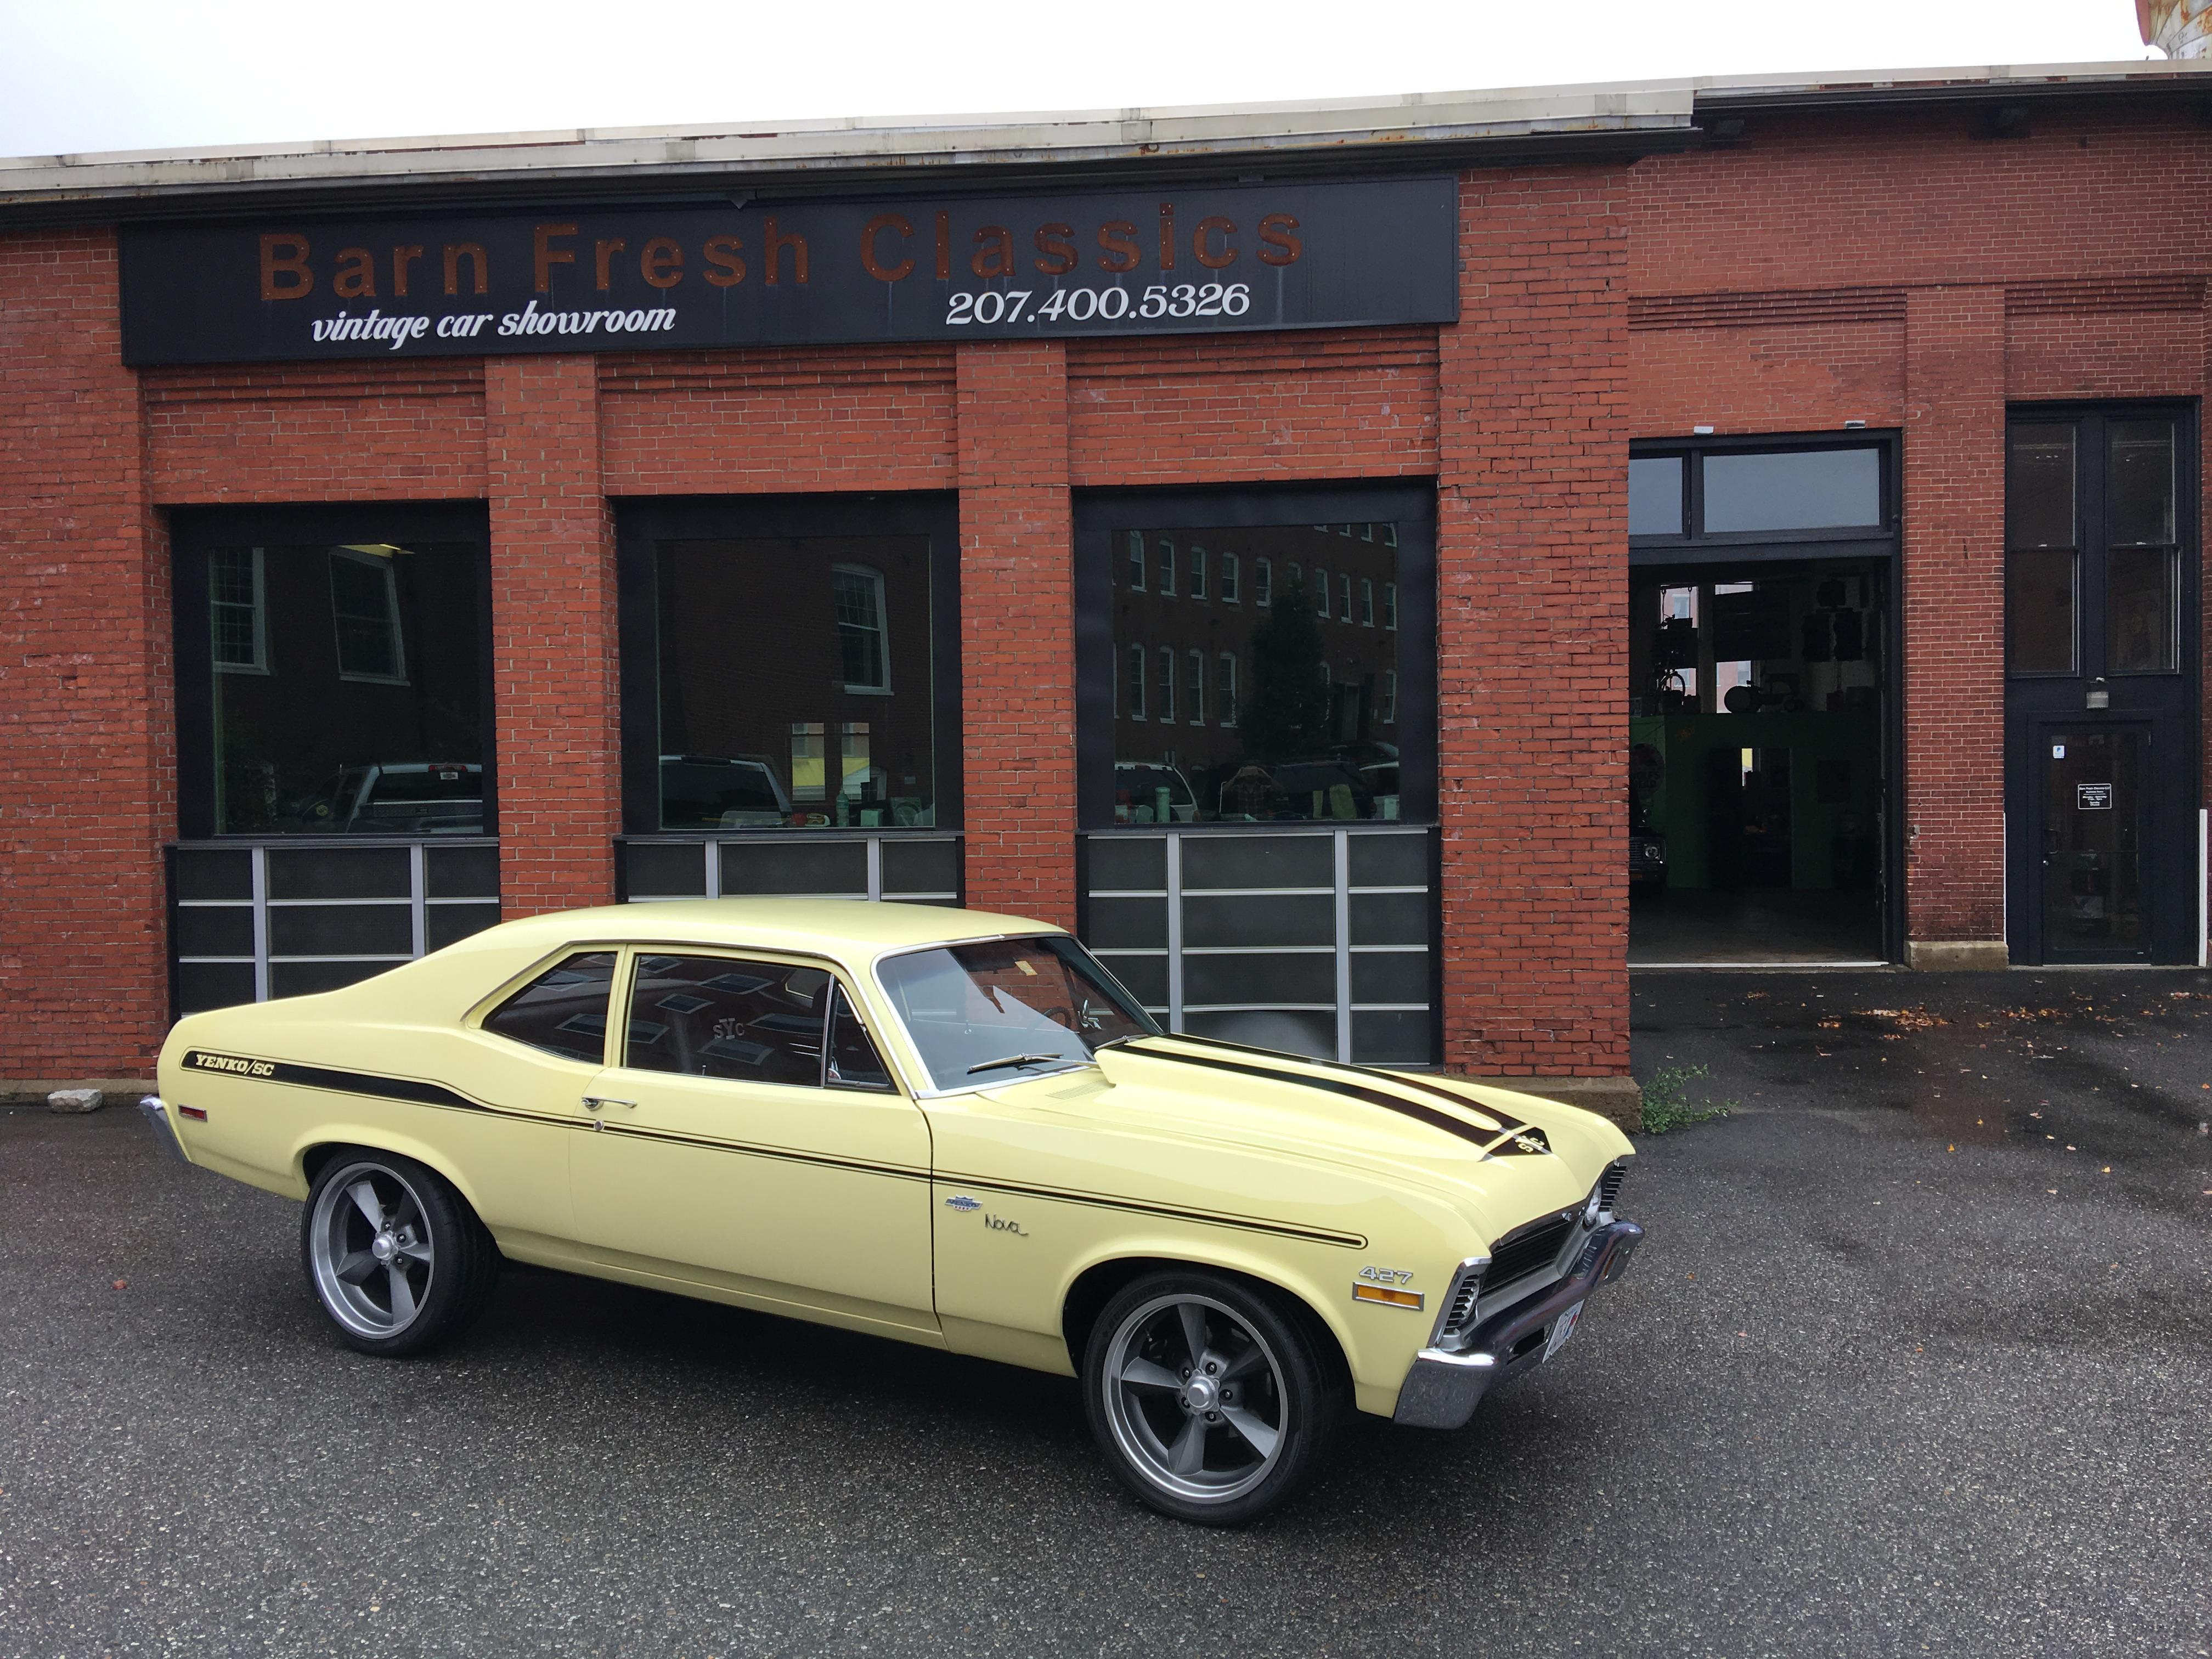 Cars for Sale Archives - Barn Fresh Classics, LLC